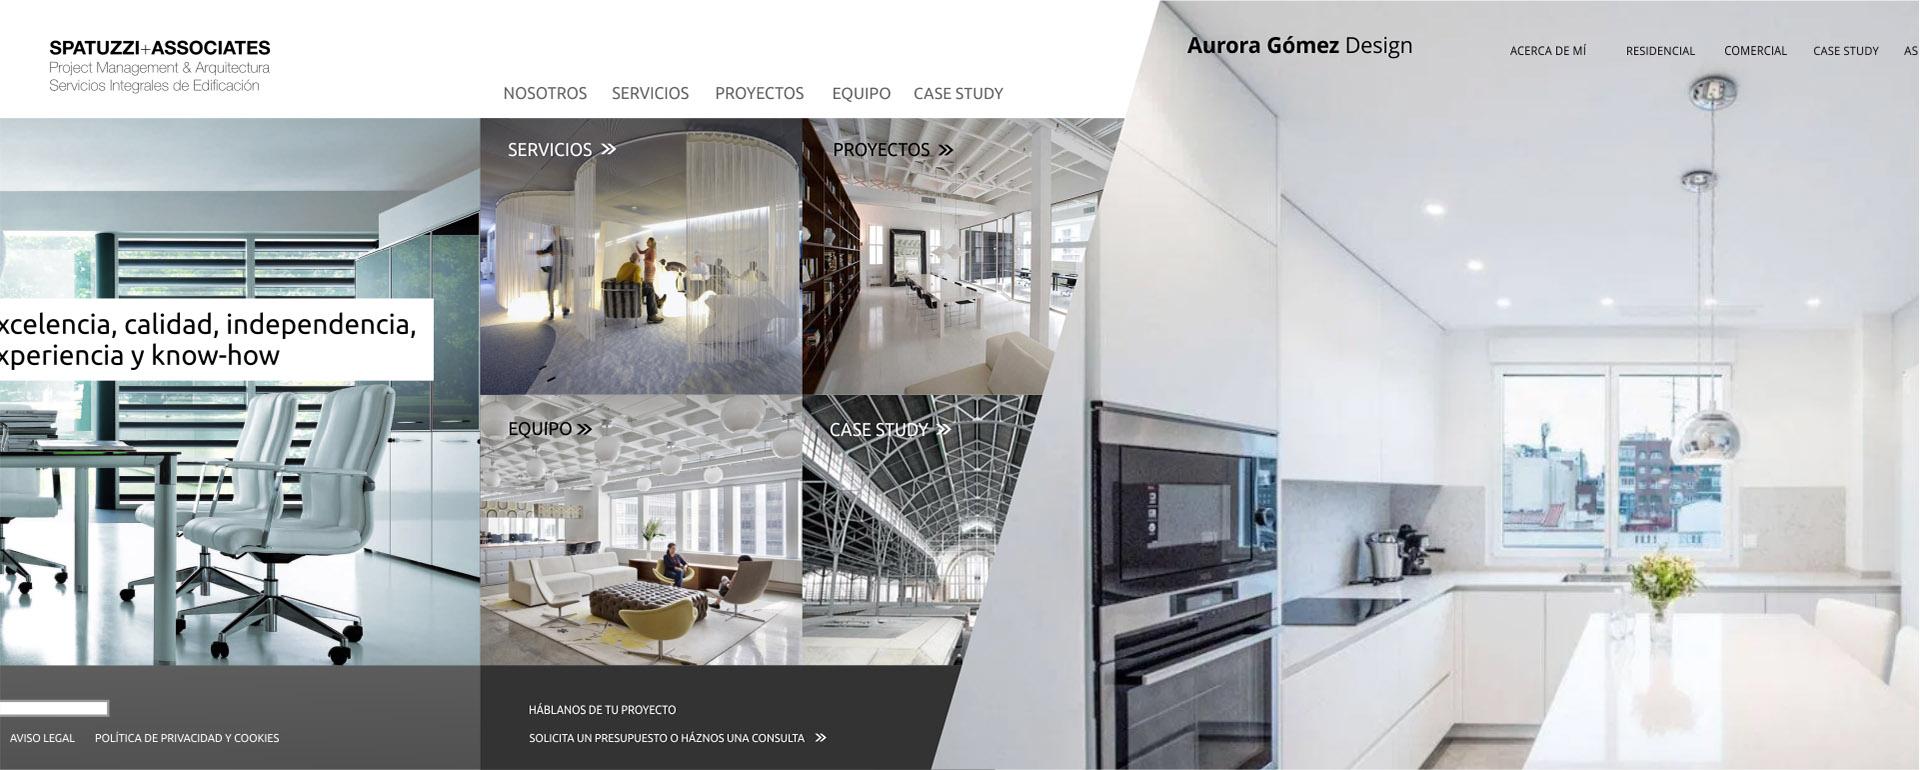 DISENO GRAFICO - Paginas web